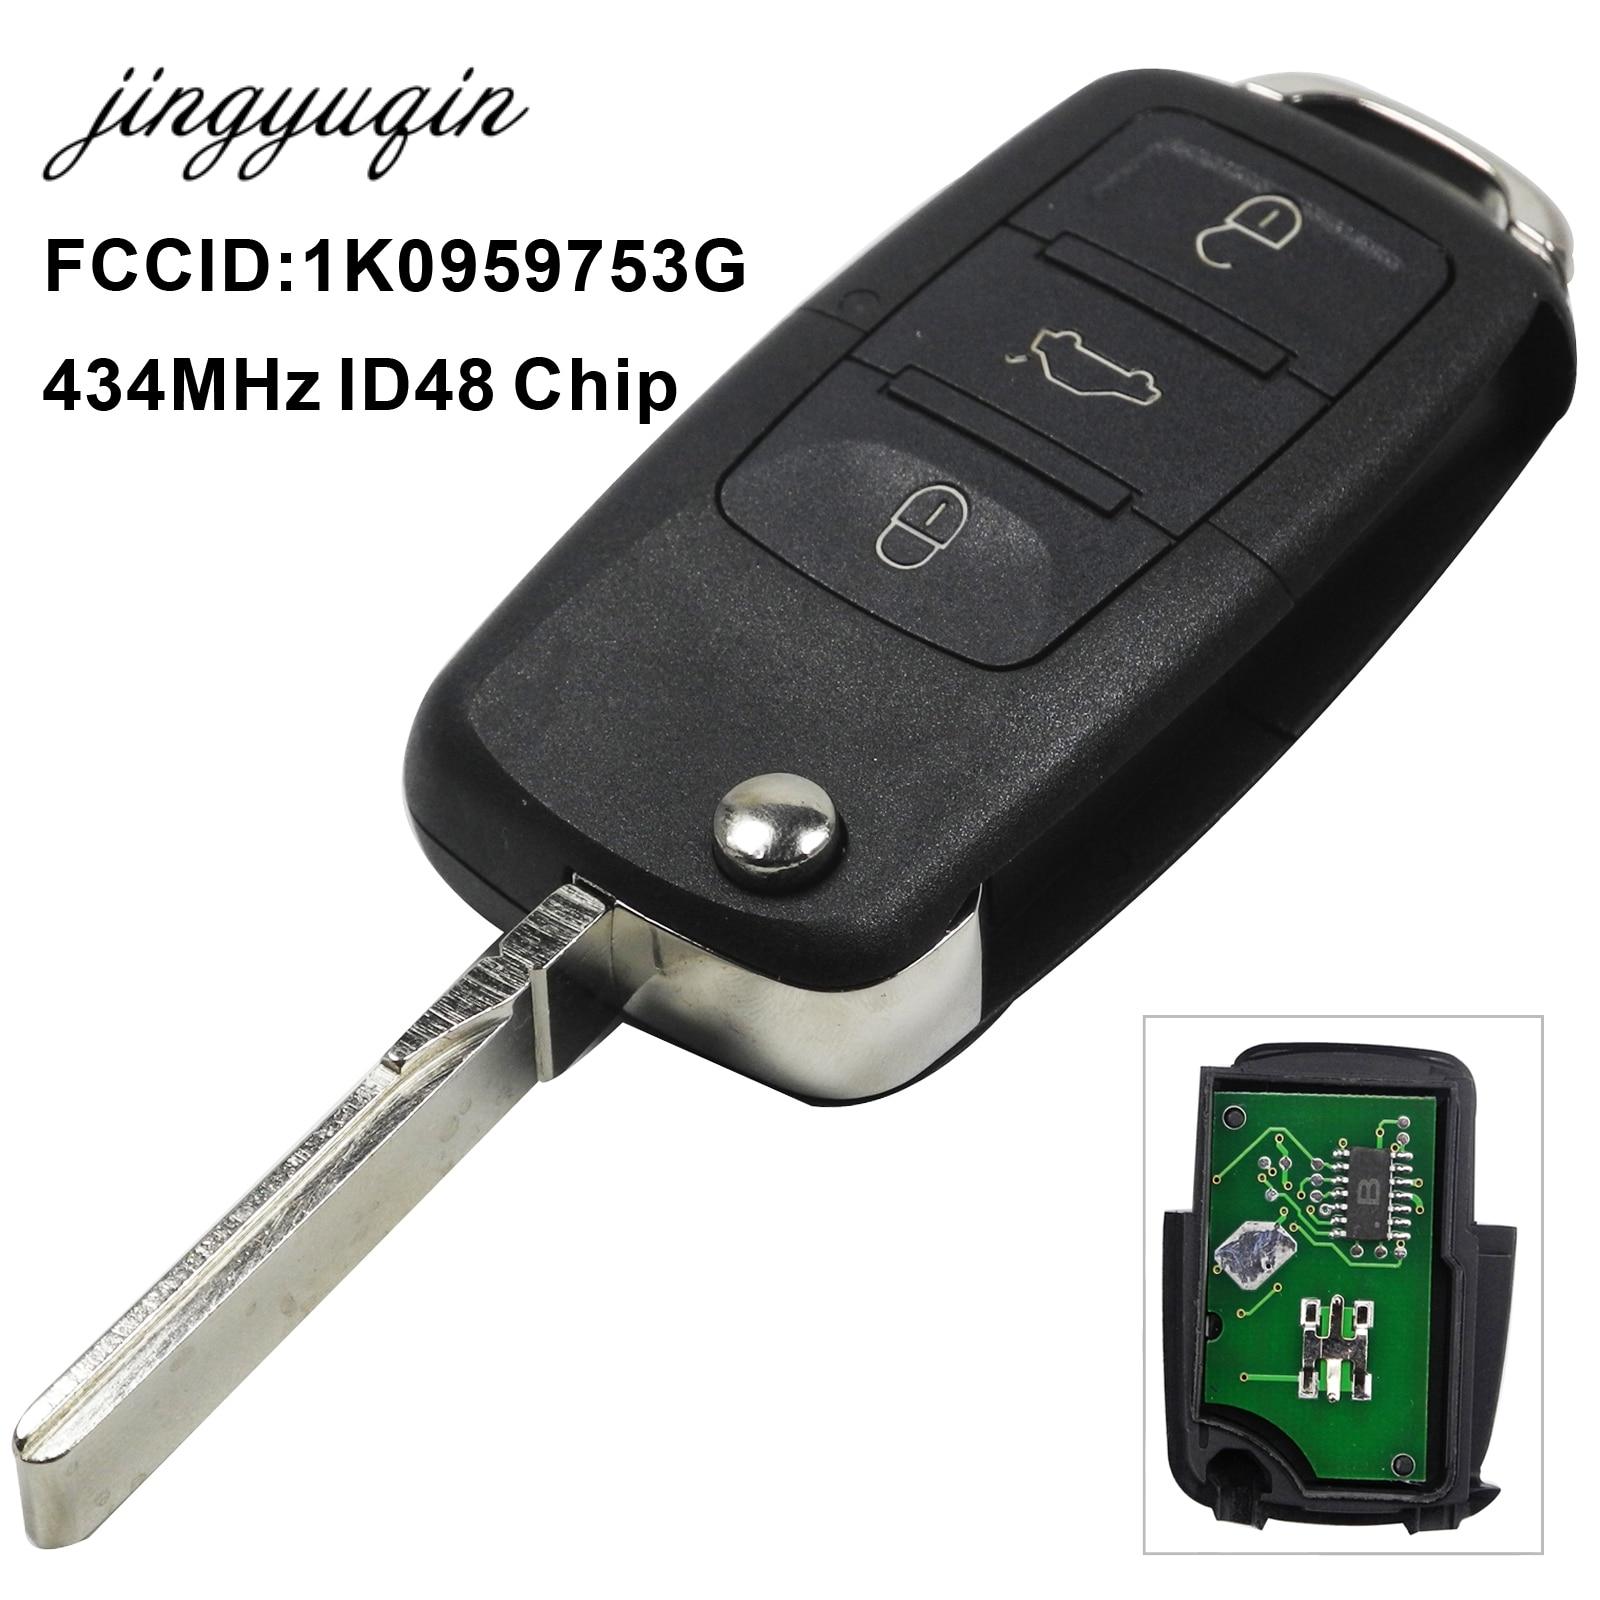 jingyuqin 434MHz ID48 Chip Car Remote Key for 1K0959753G 5FA009263-10 for Caddy EOS GOLF Jetta Sirocco Tiguan Touran 2003-2009